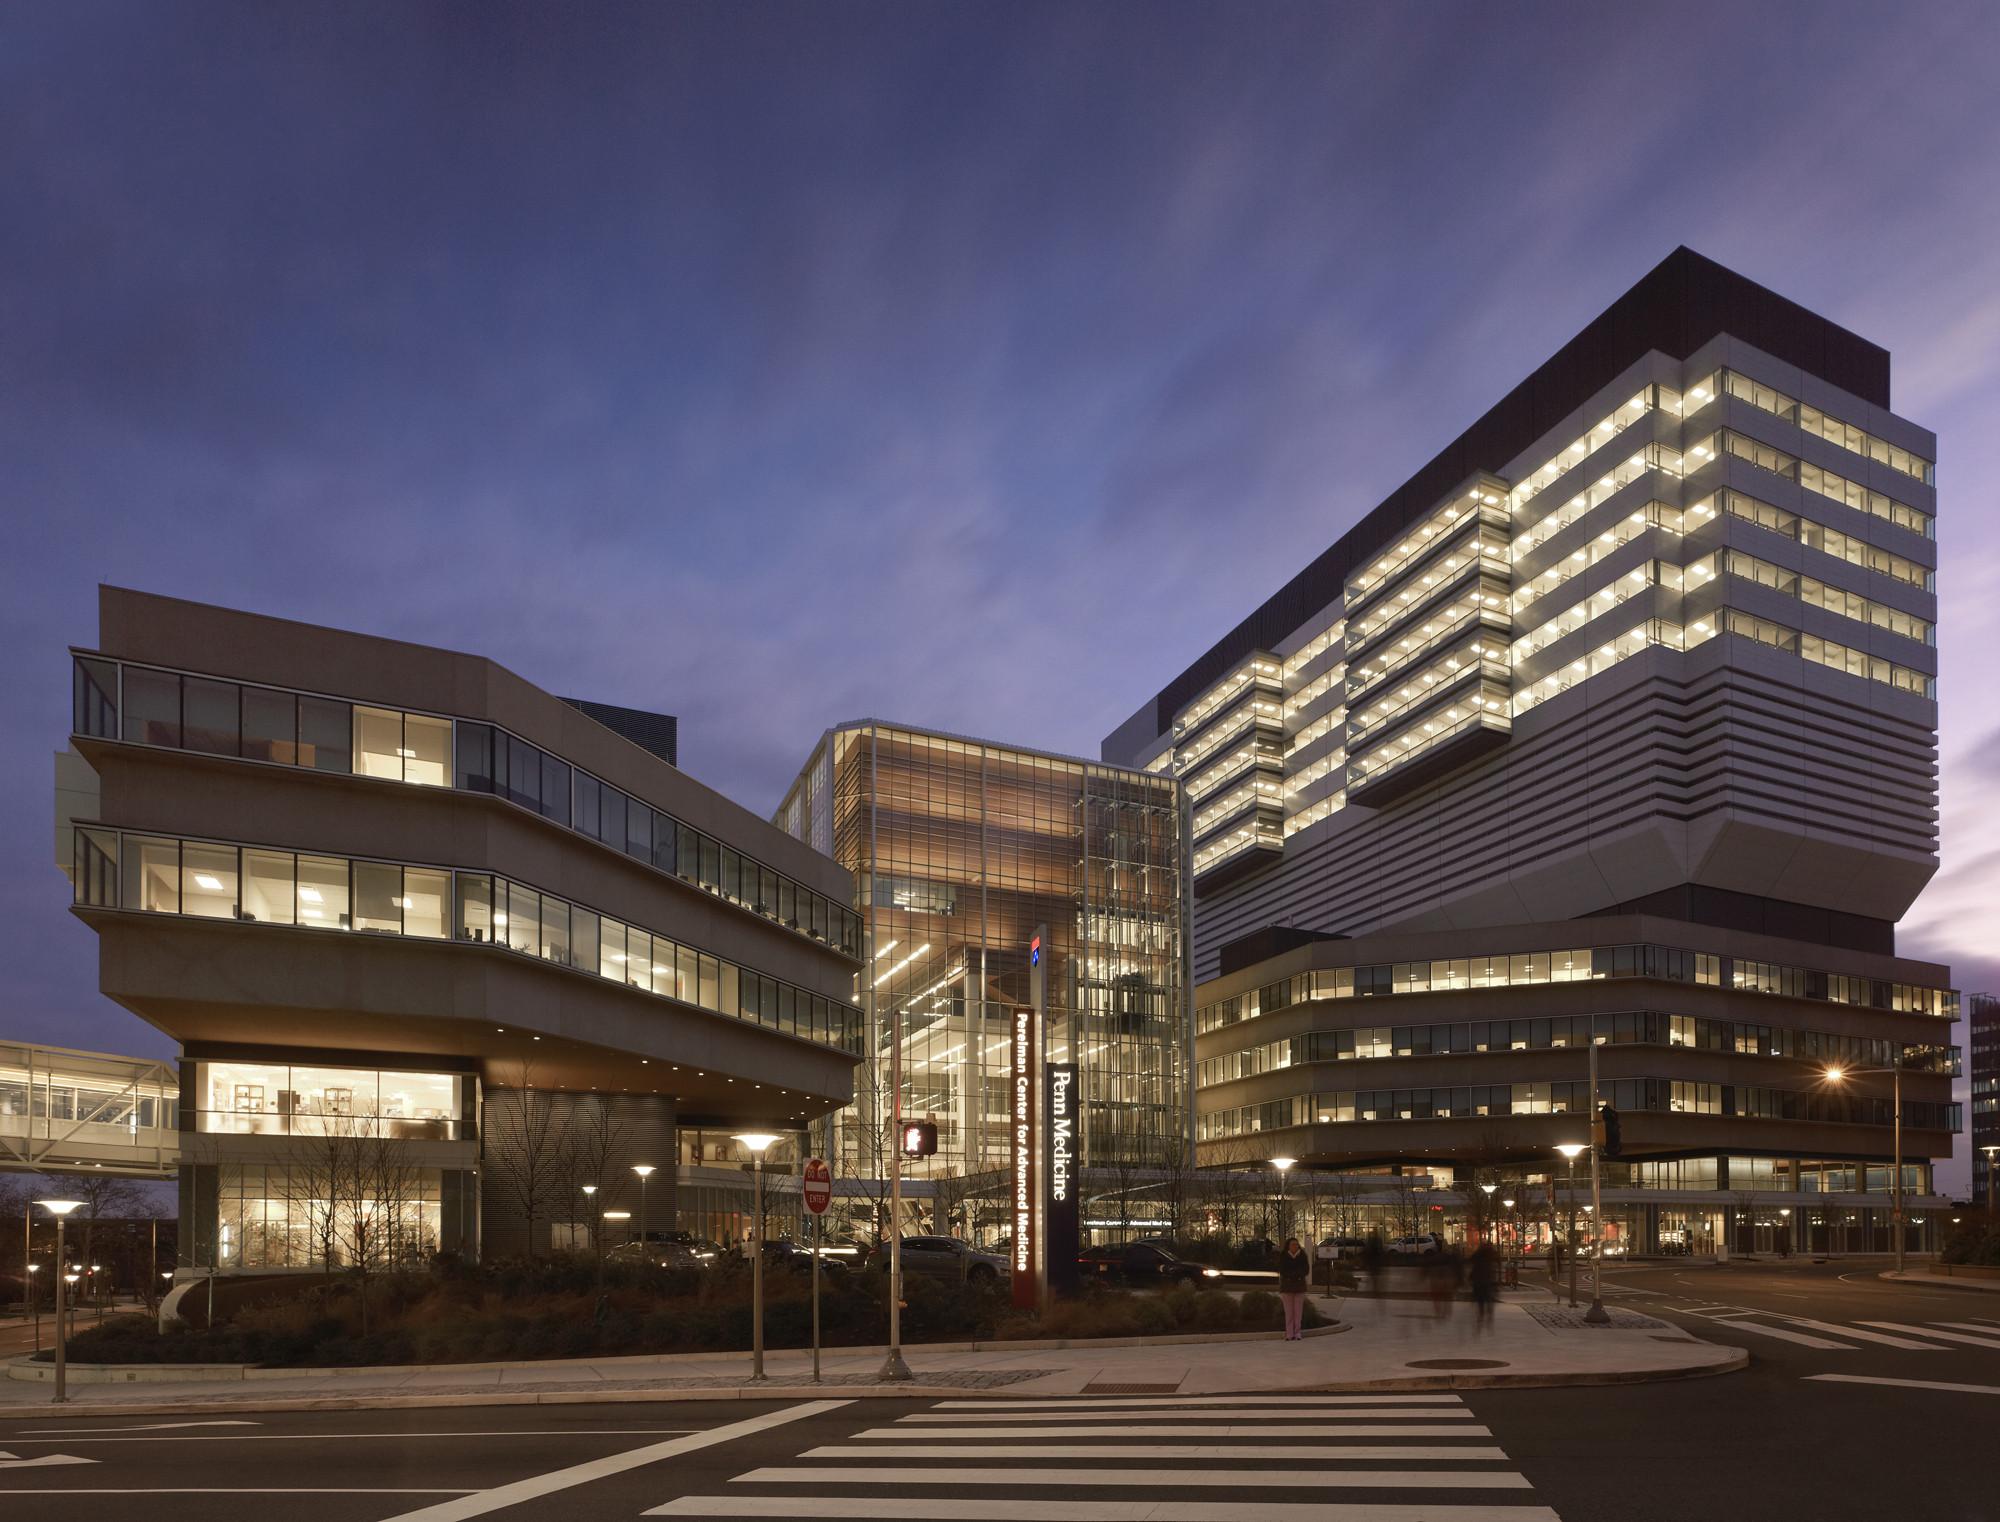 Translational Research Center / Rafael Viñoly Architects, © Brad Feinknopf